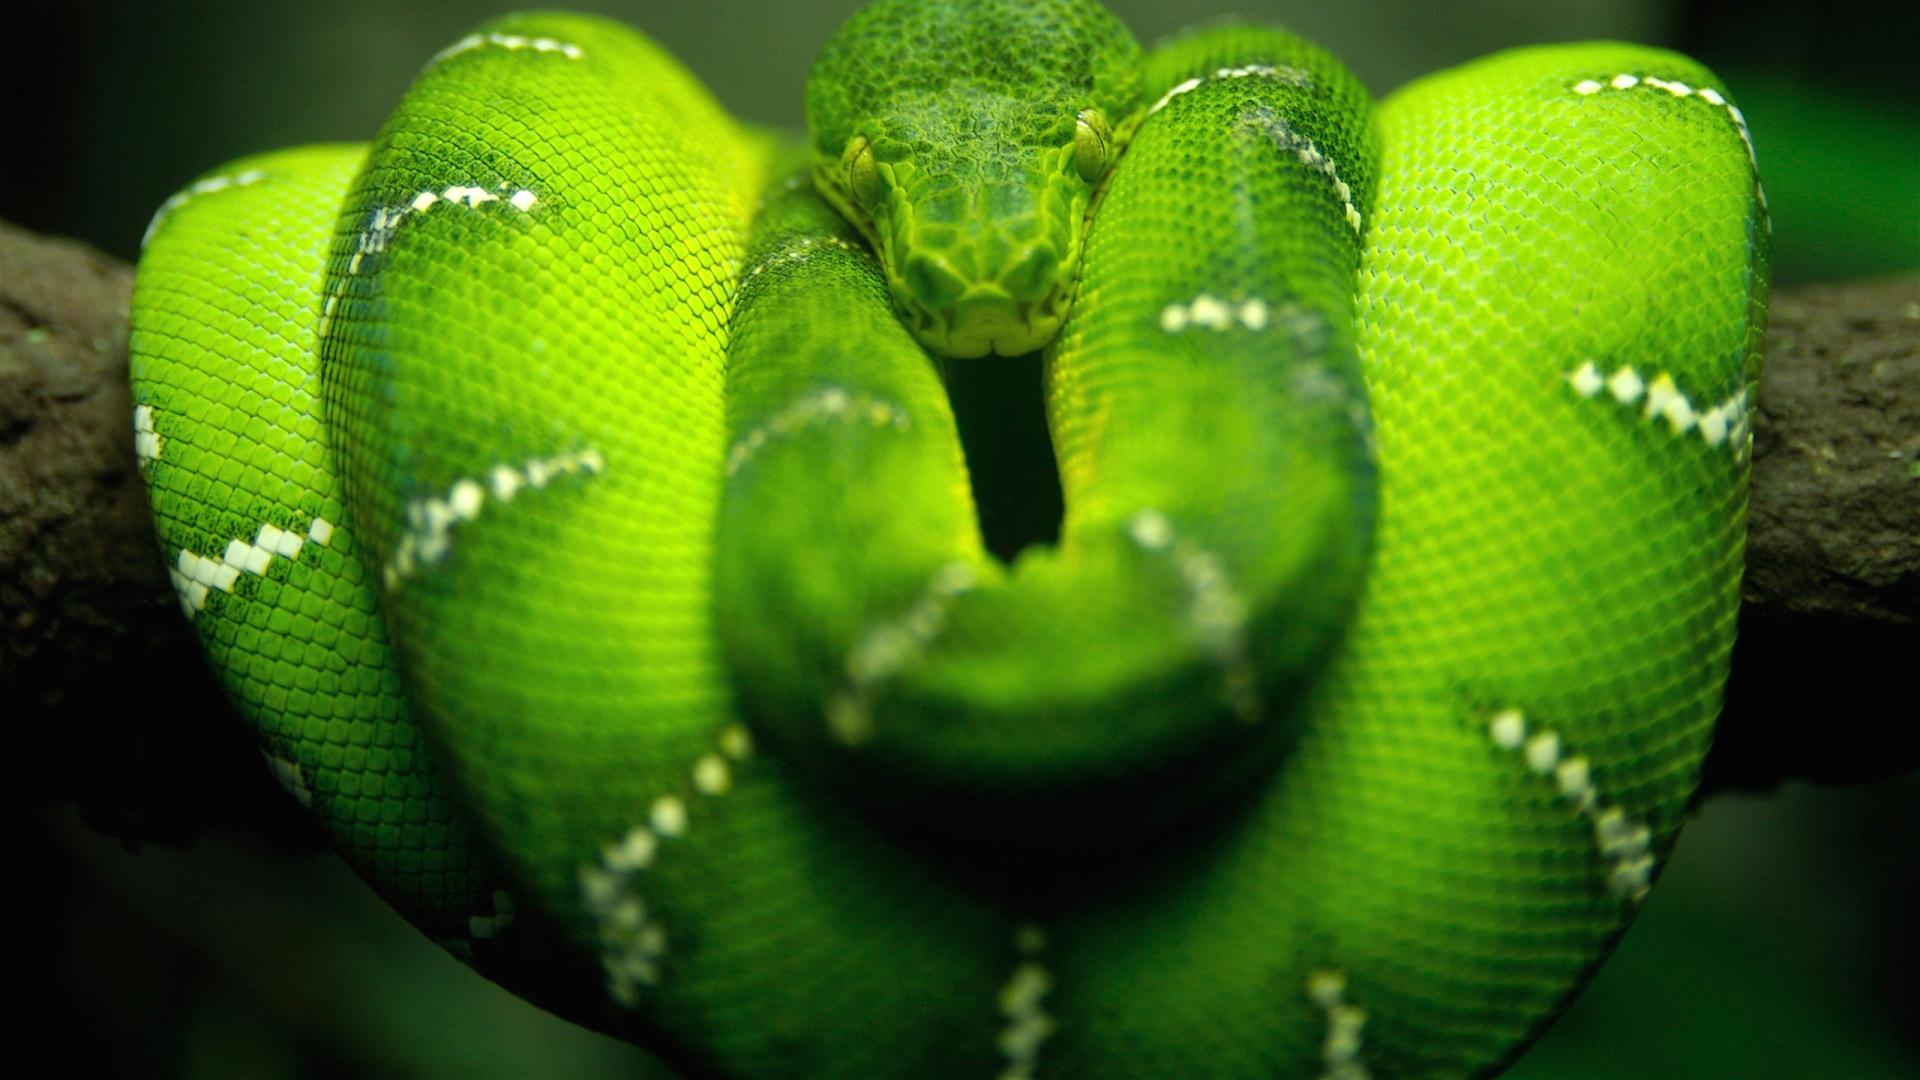 змея, зеленая, красивая